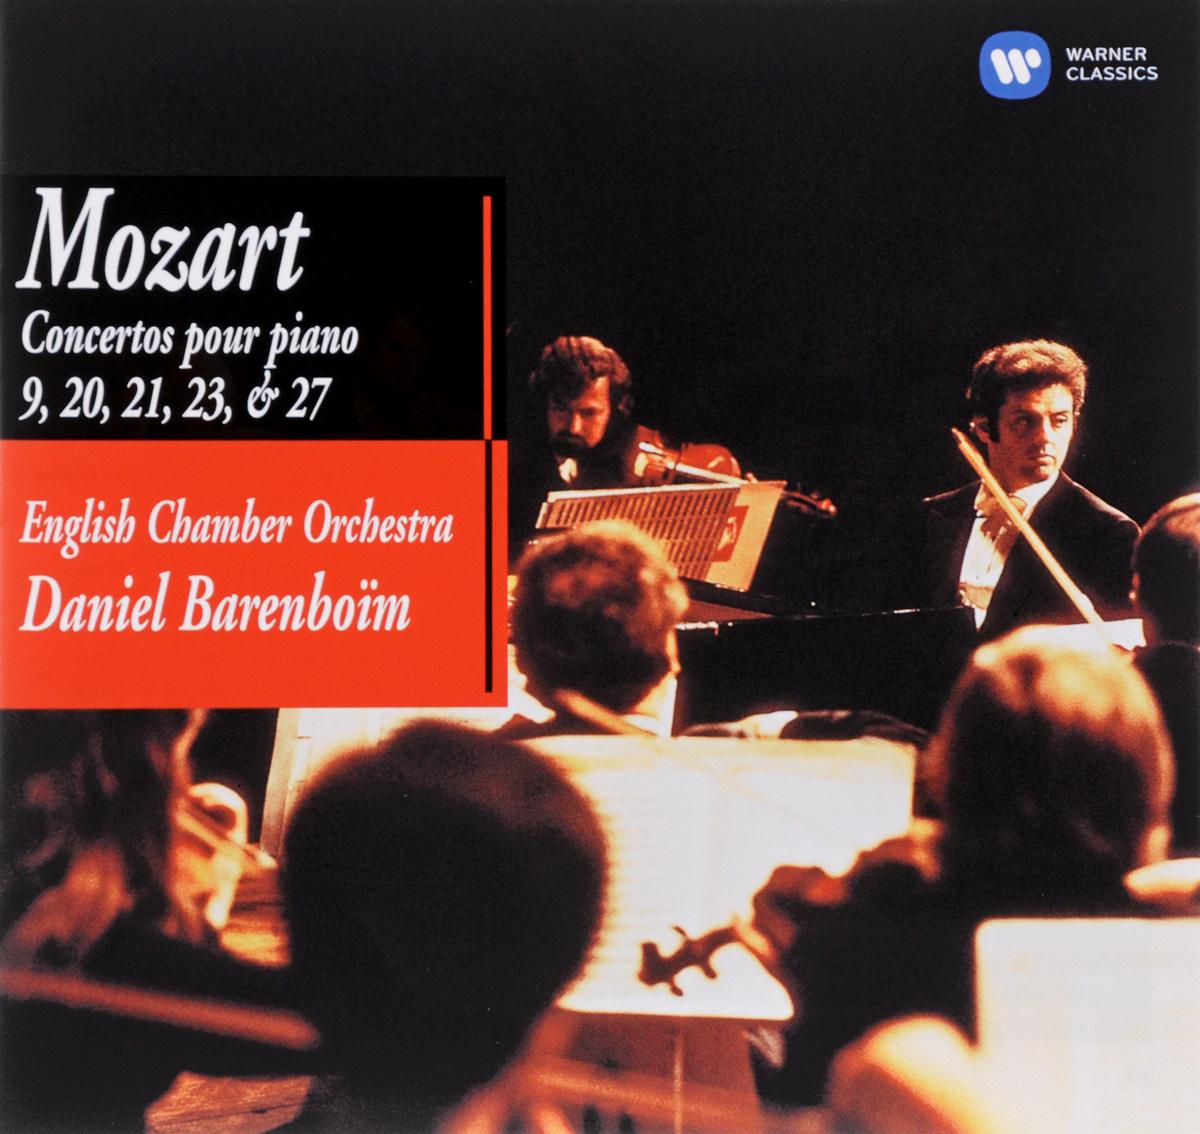 цена Дэниэл Баренбойм,English Chamber Orchestra Daniel Barenboim. English Chamber Orchestra Piano Concerto Nos. 9, 20, 21, 23 & 27 (2 CD) онлайн в 2017 году